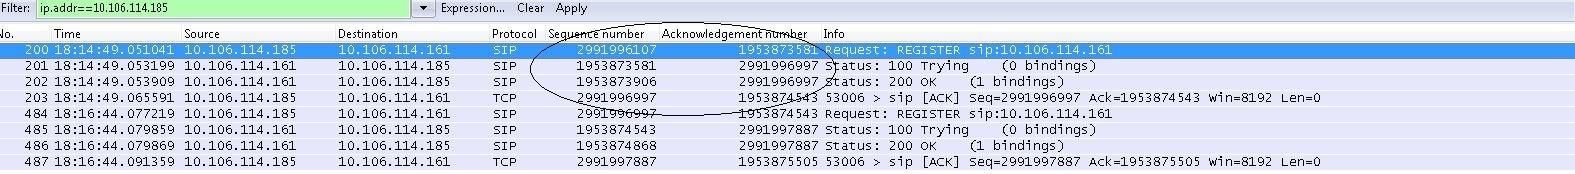 Troubleshoot IP Phone Unregistration - A Case Study - Cisco